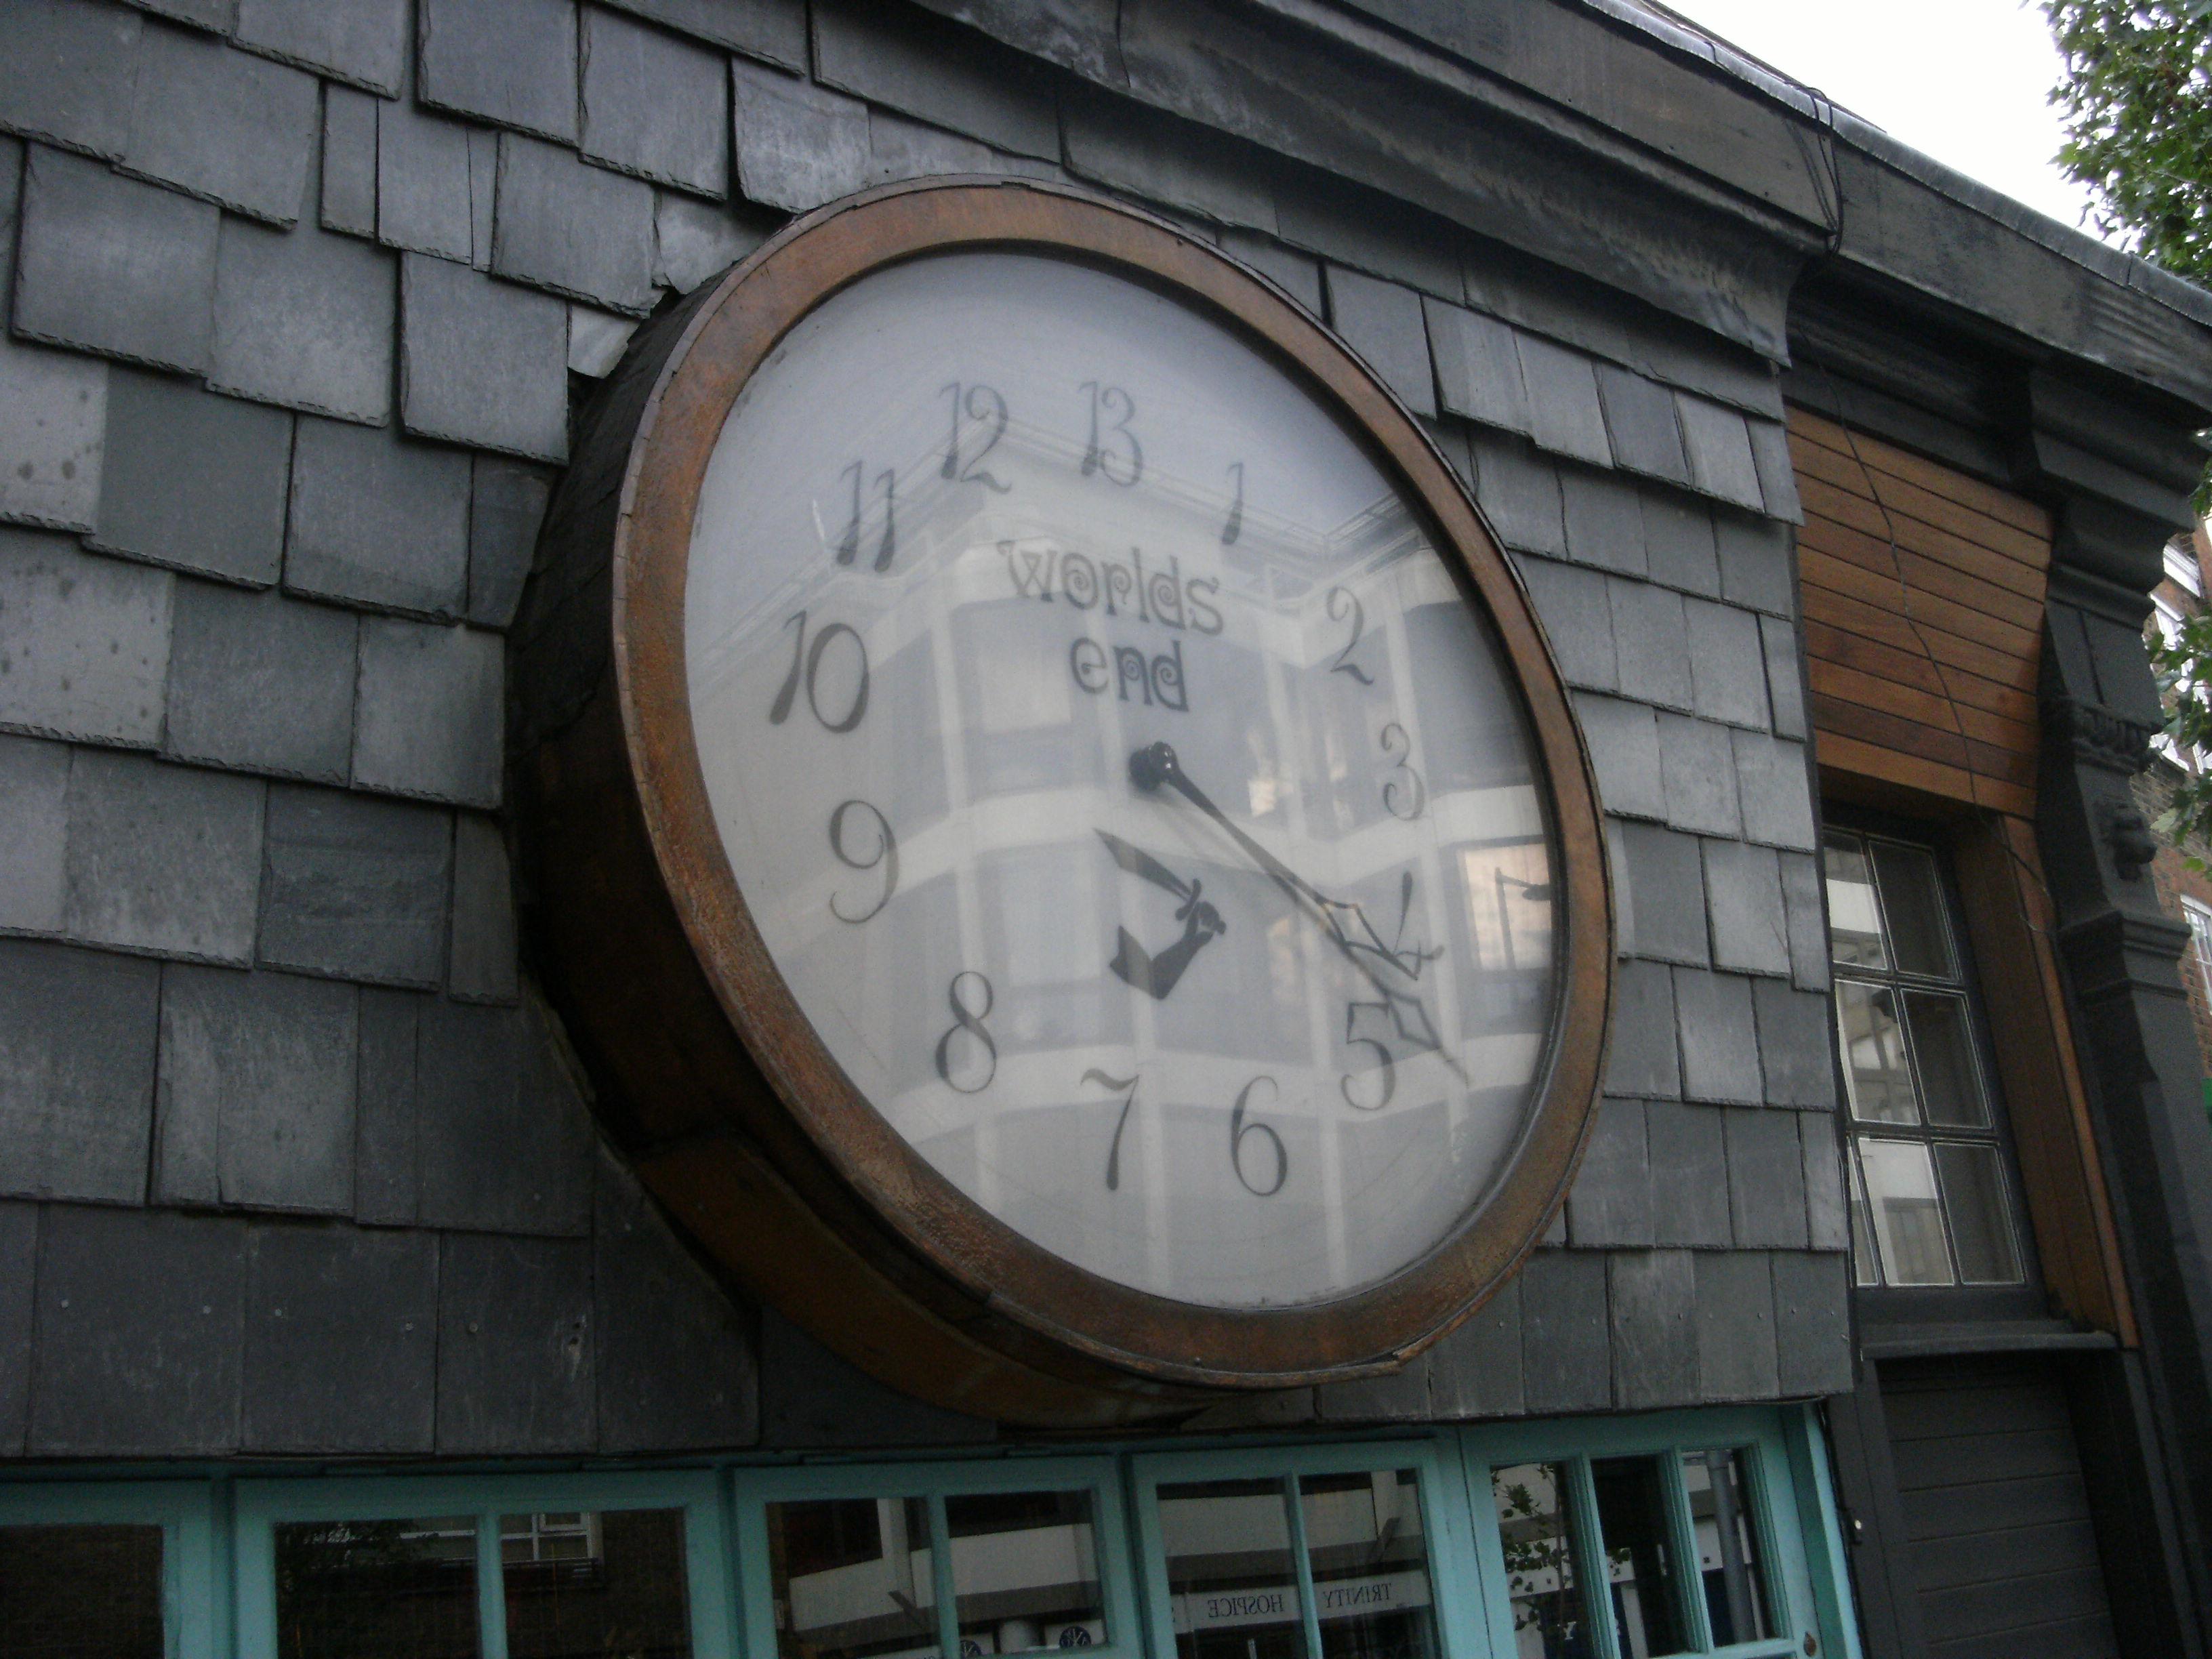 bda255defc File:Clock on World's End shop of Vivienne Westwood 4 June 2011.jpg ...